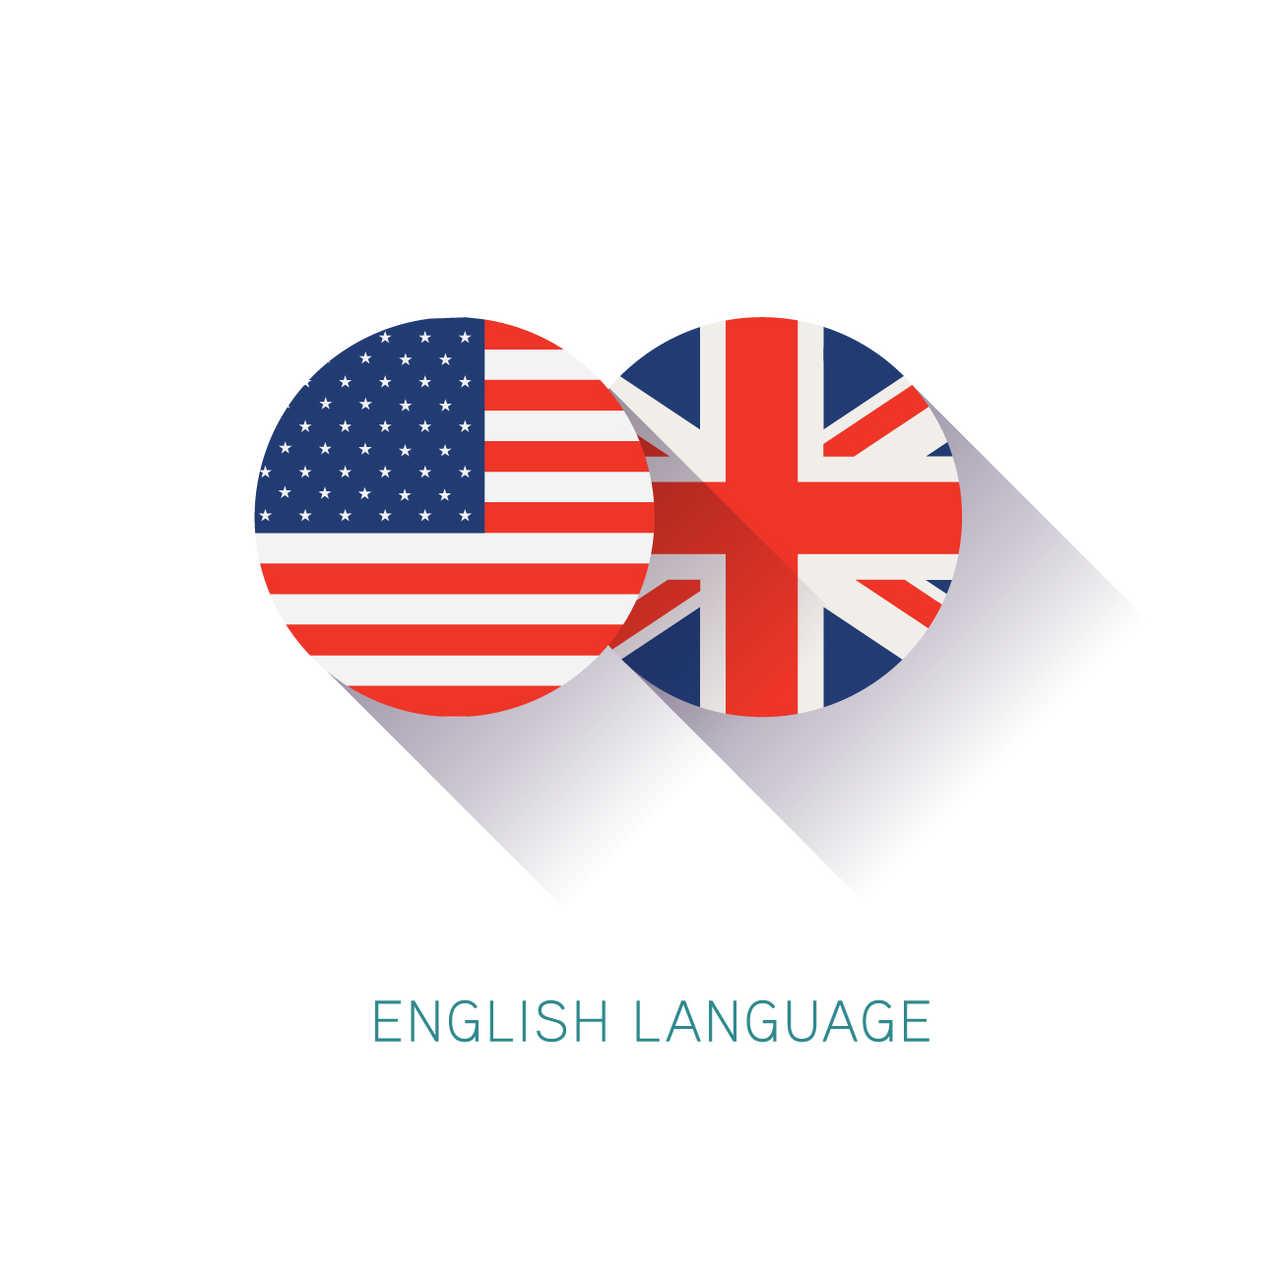 inglês na rota da fluência vale a pena é bom